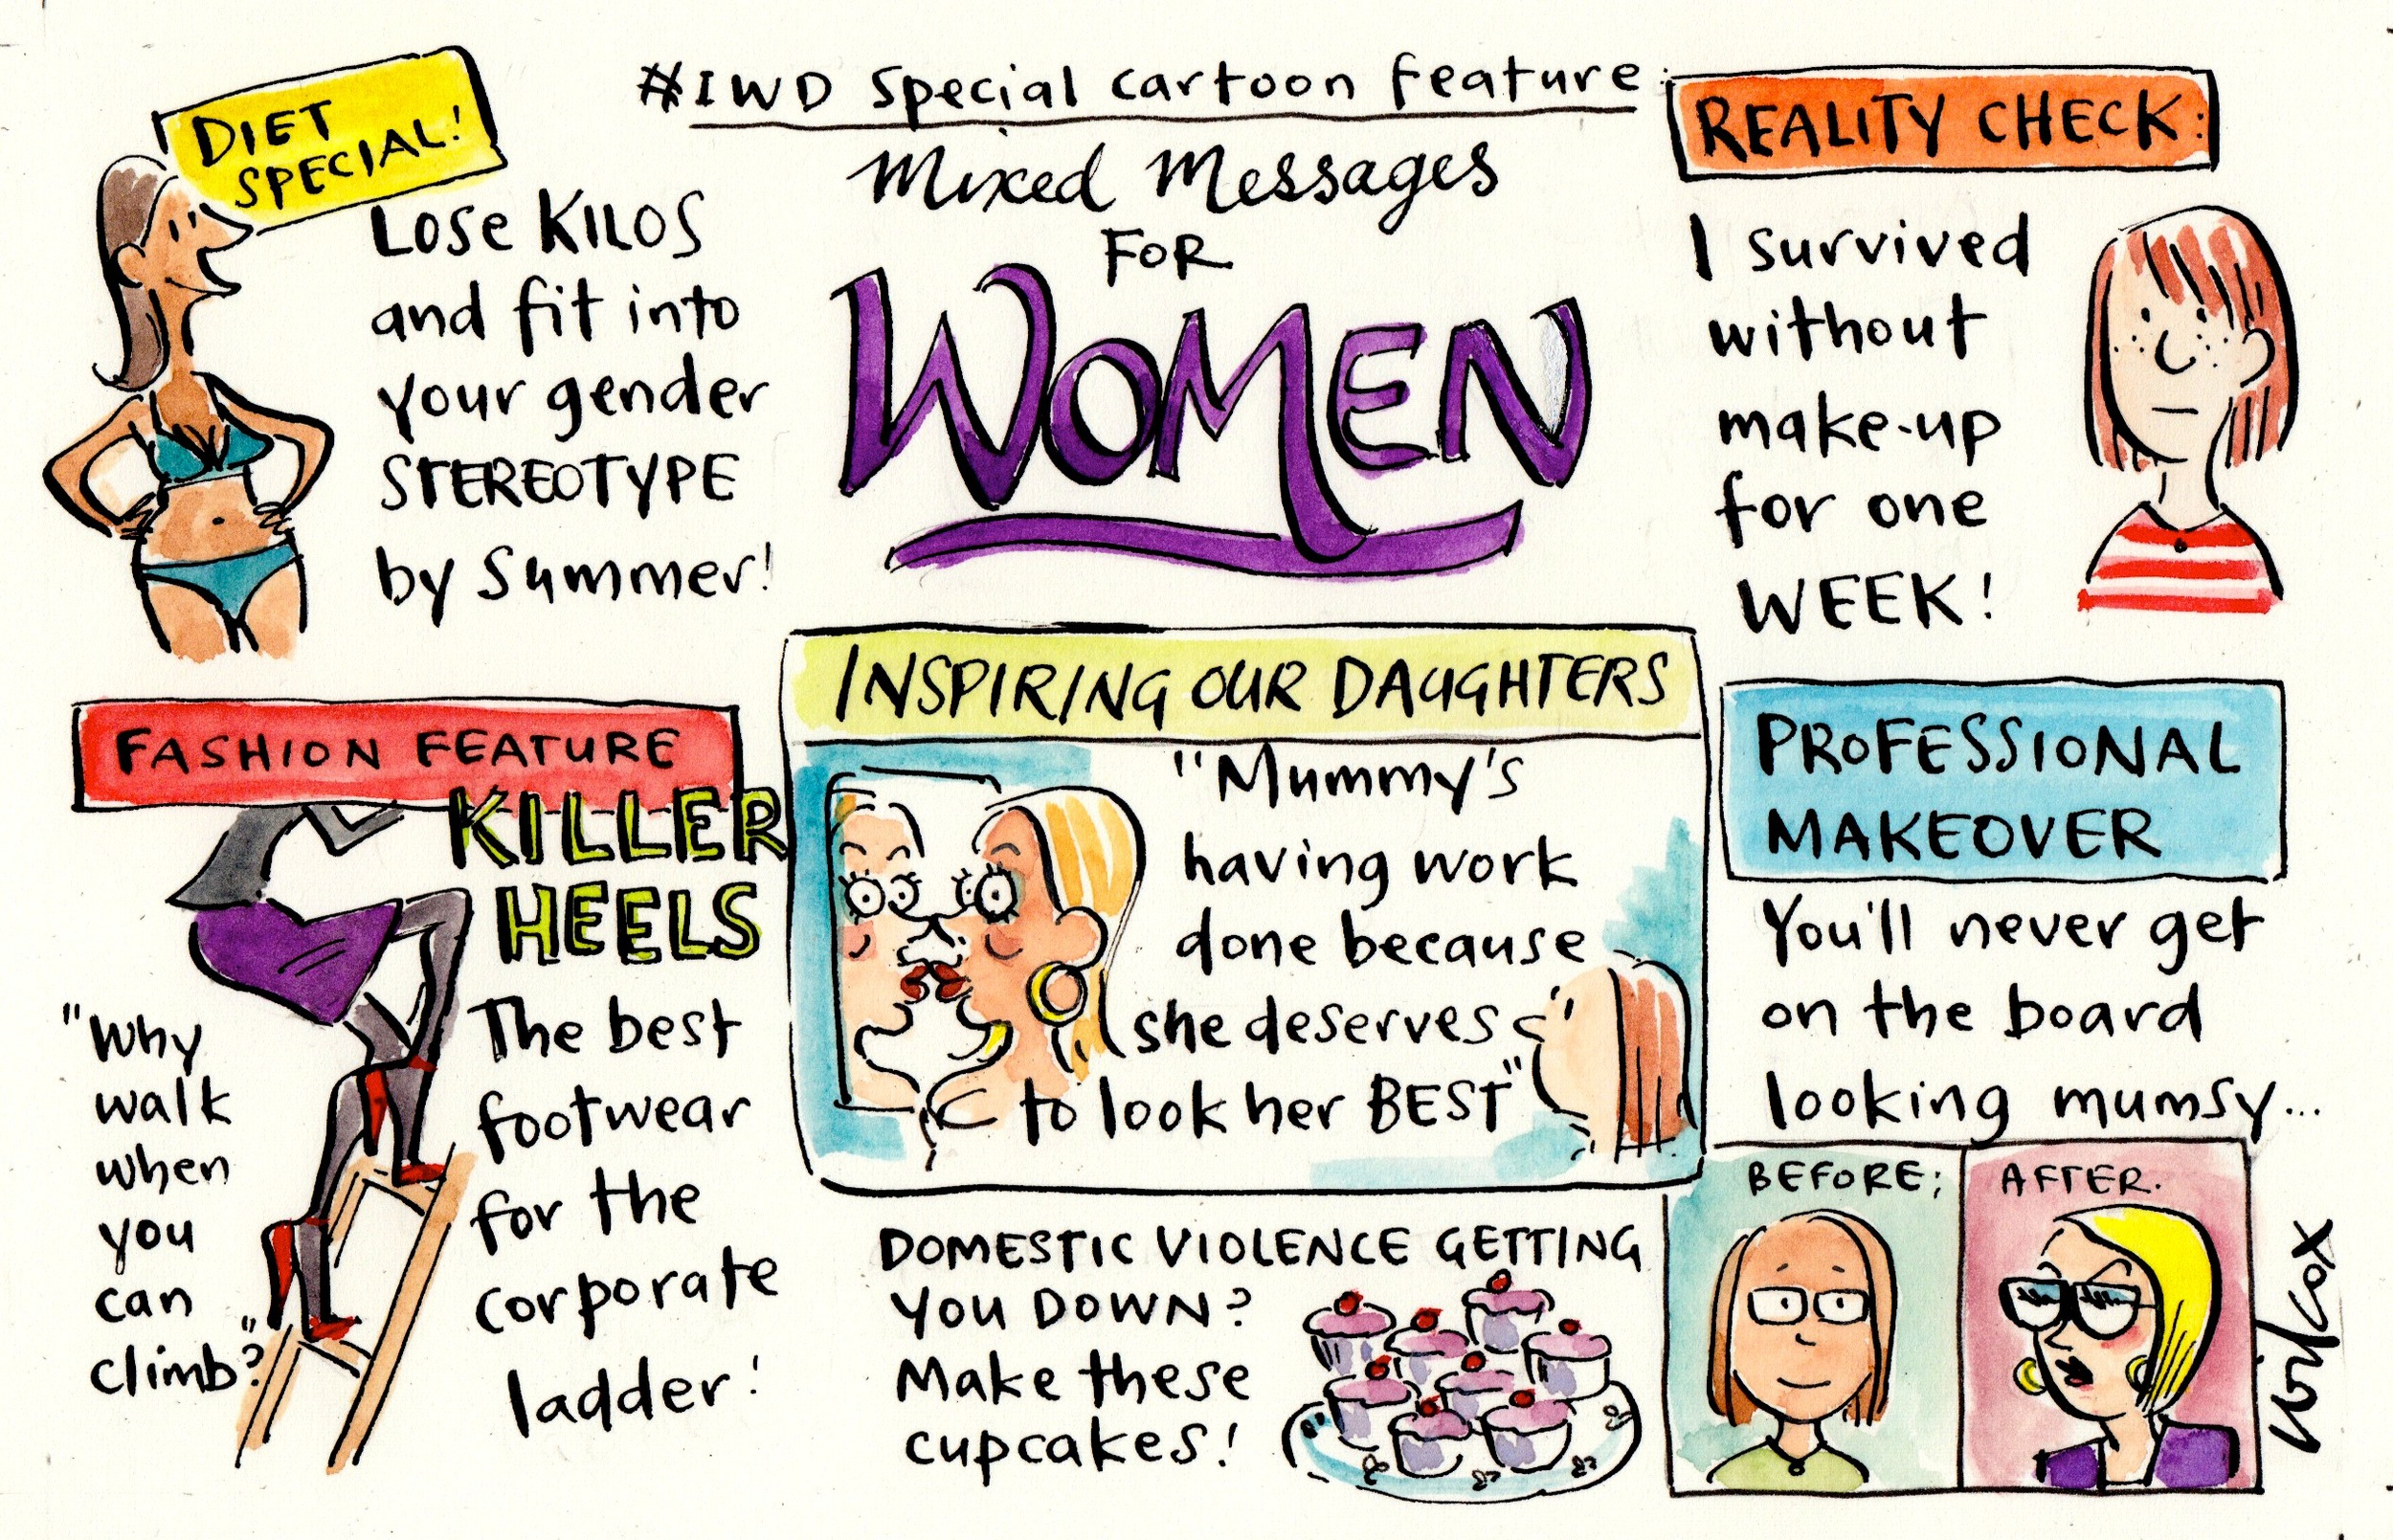 mixed messages for women.jpeg